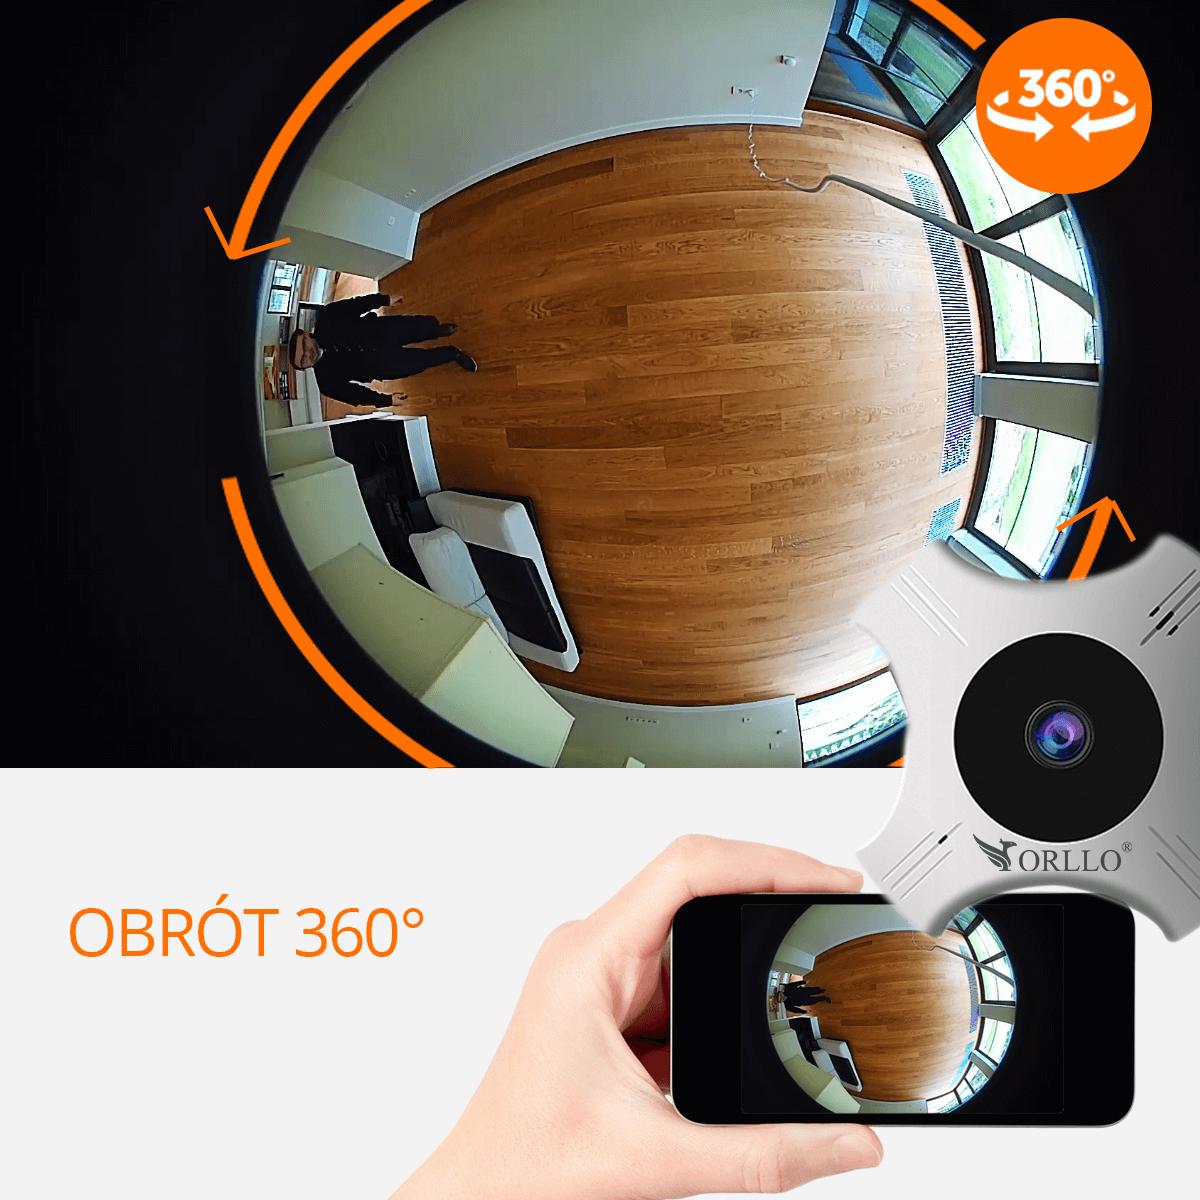 Kamera-bezprzewodowa-vision360-obrotowa-orllo-pl